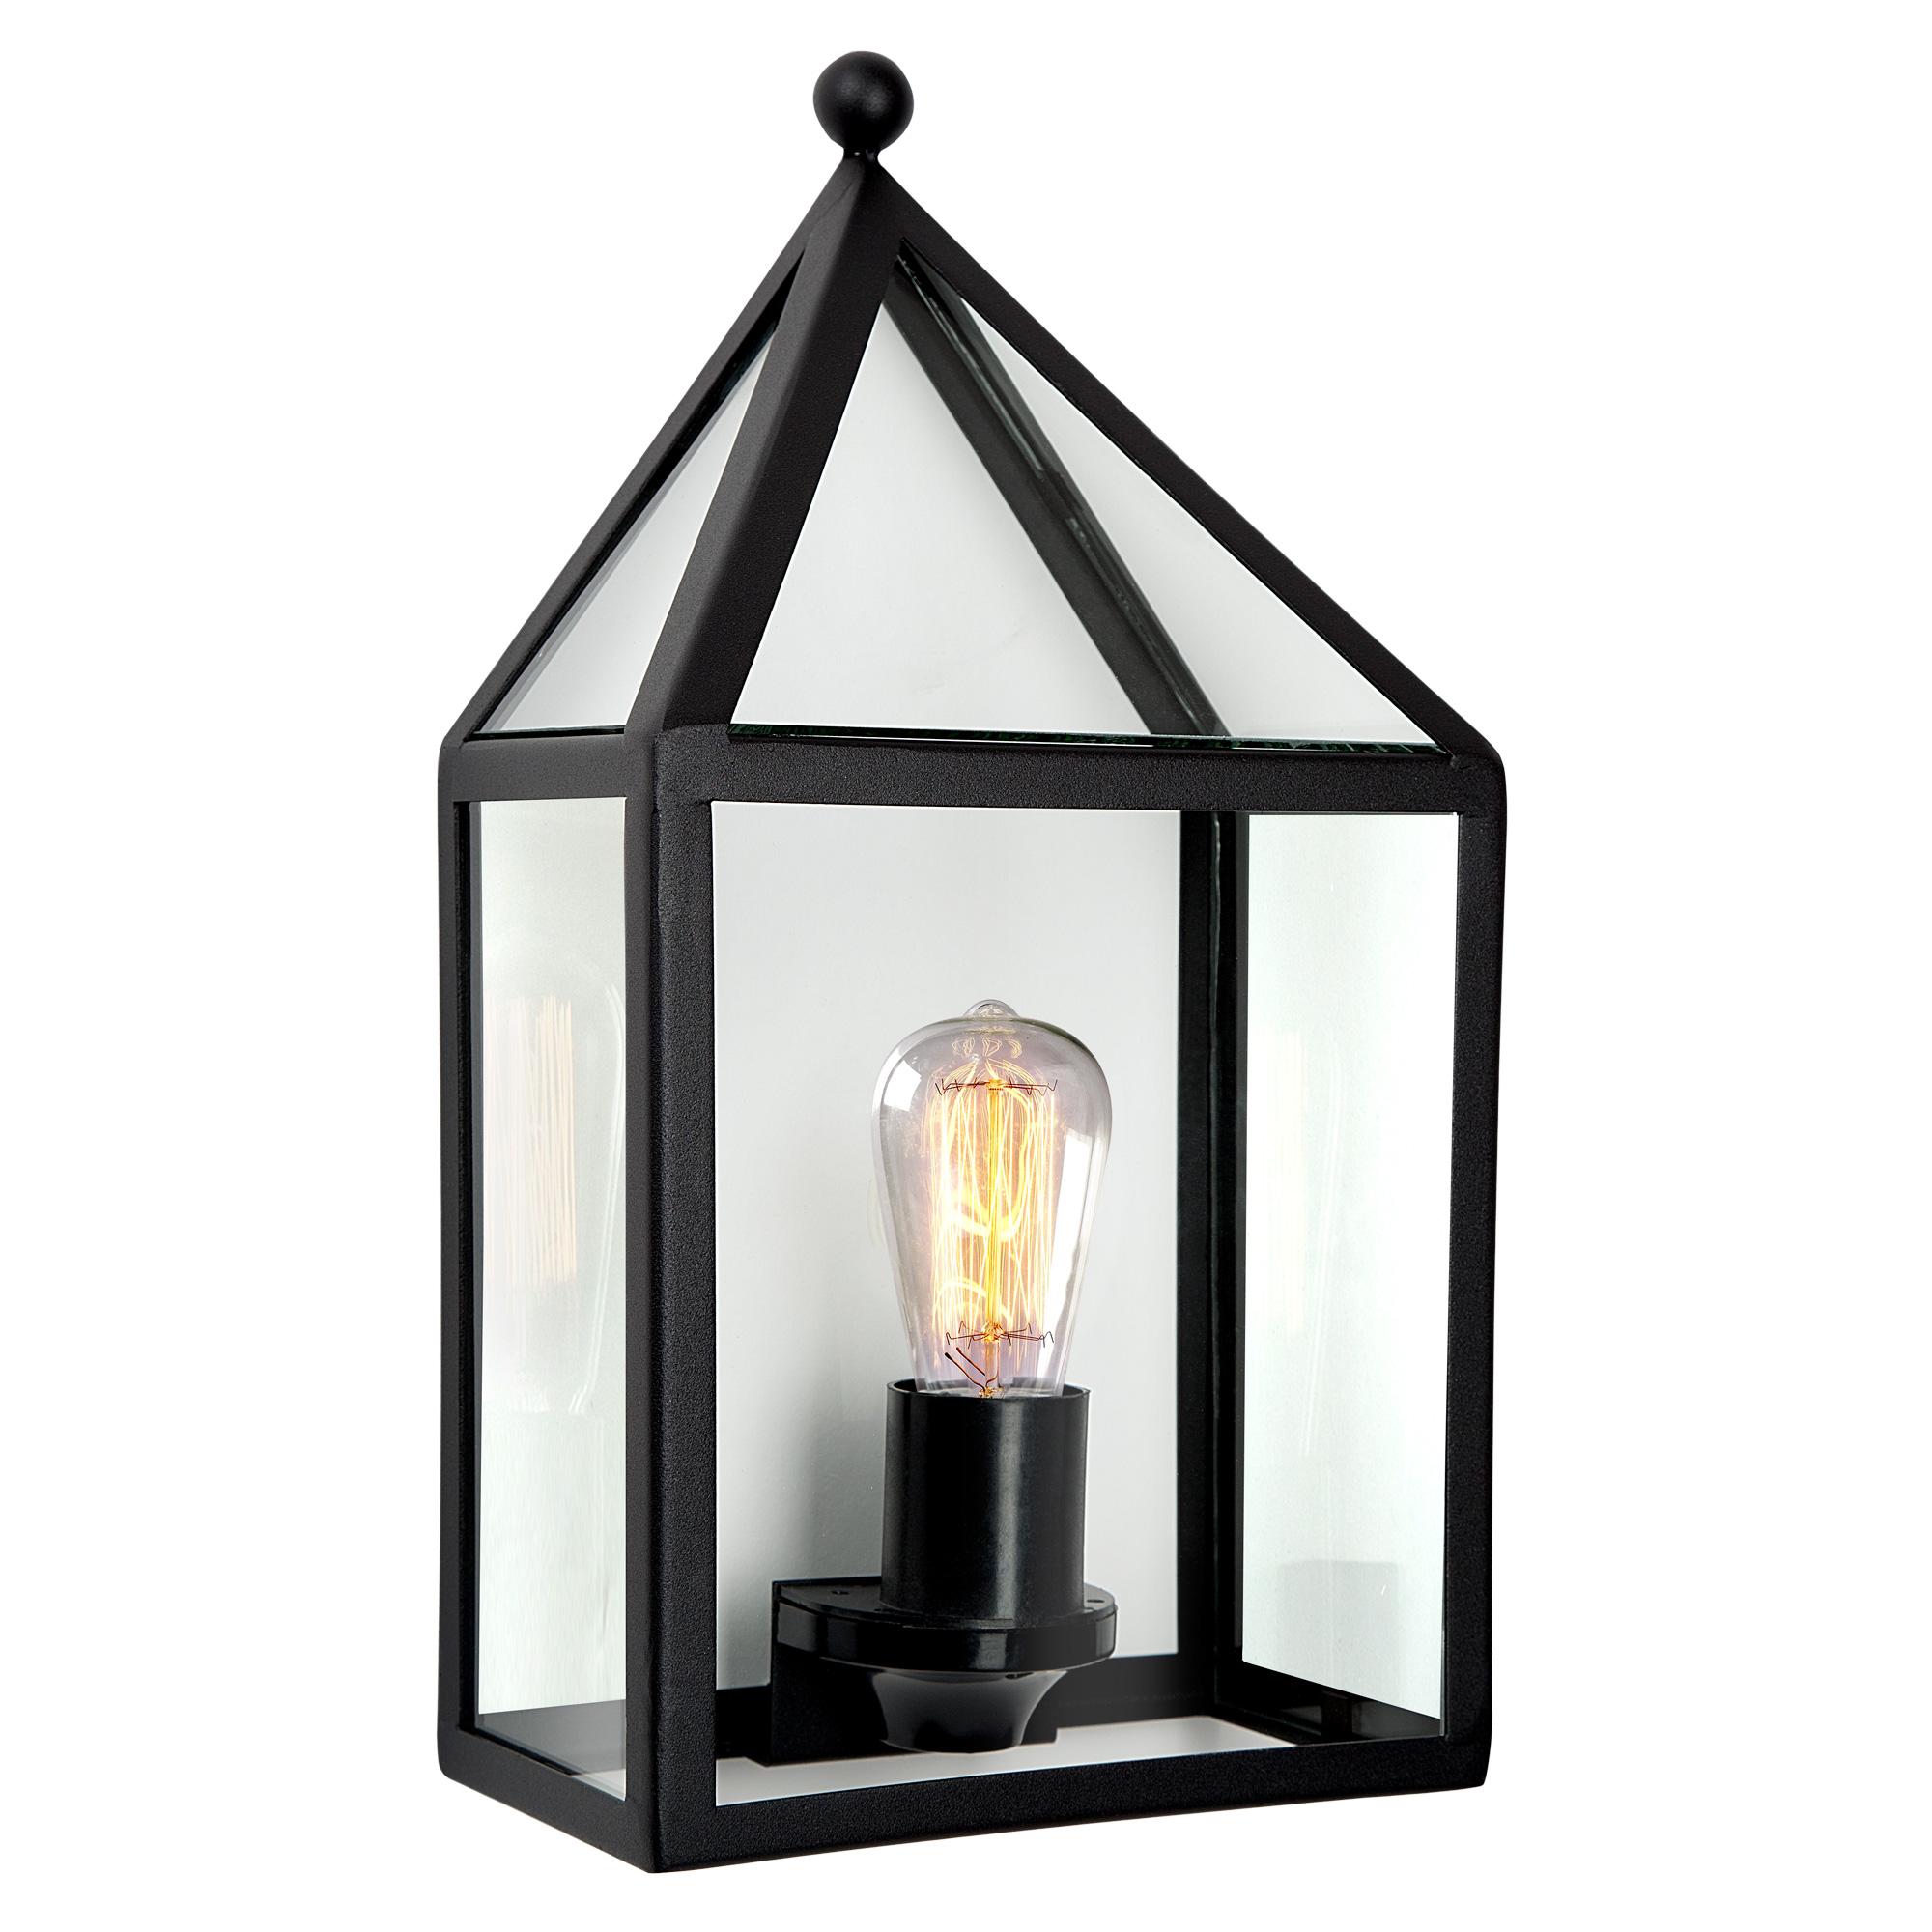 Buitenlamp Laren Zwart Wandlamp Plat